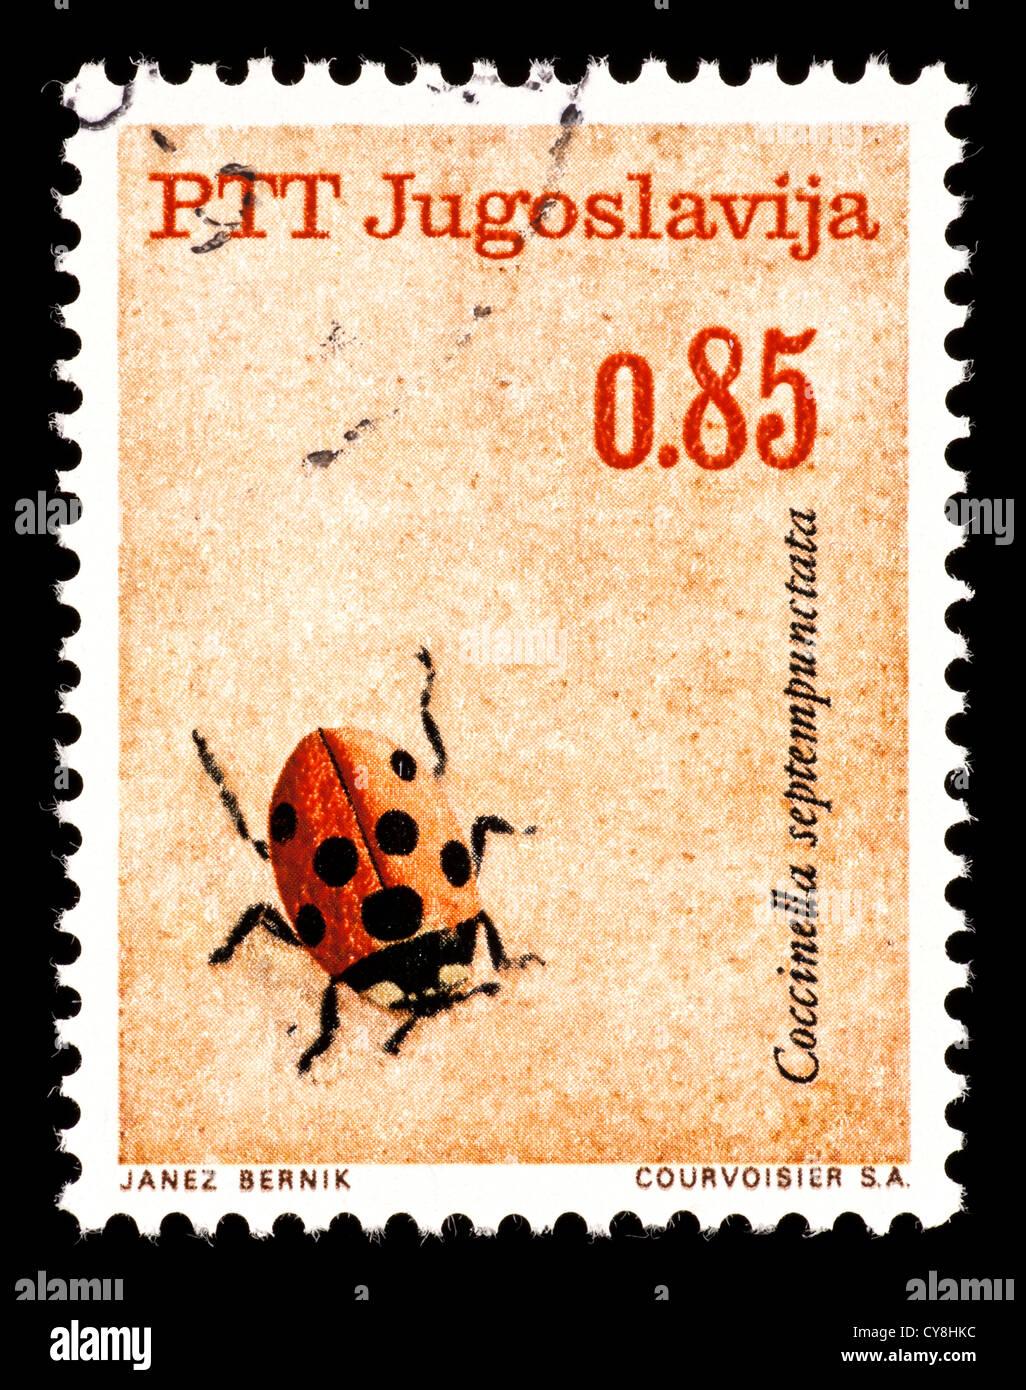 Postage Stamp From Yugoslavia Depicting A Ladybug Beetle Coccinella Septempunctata